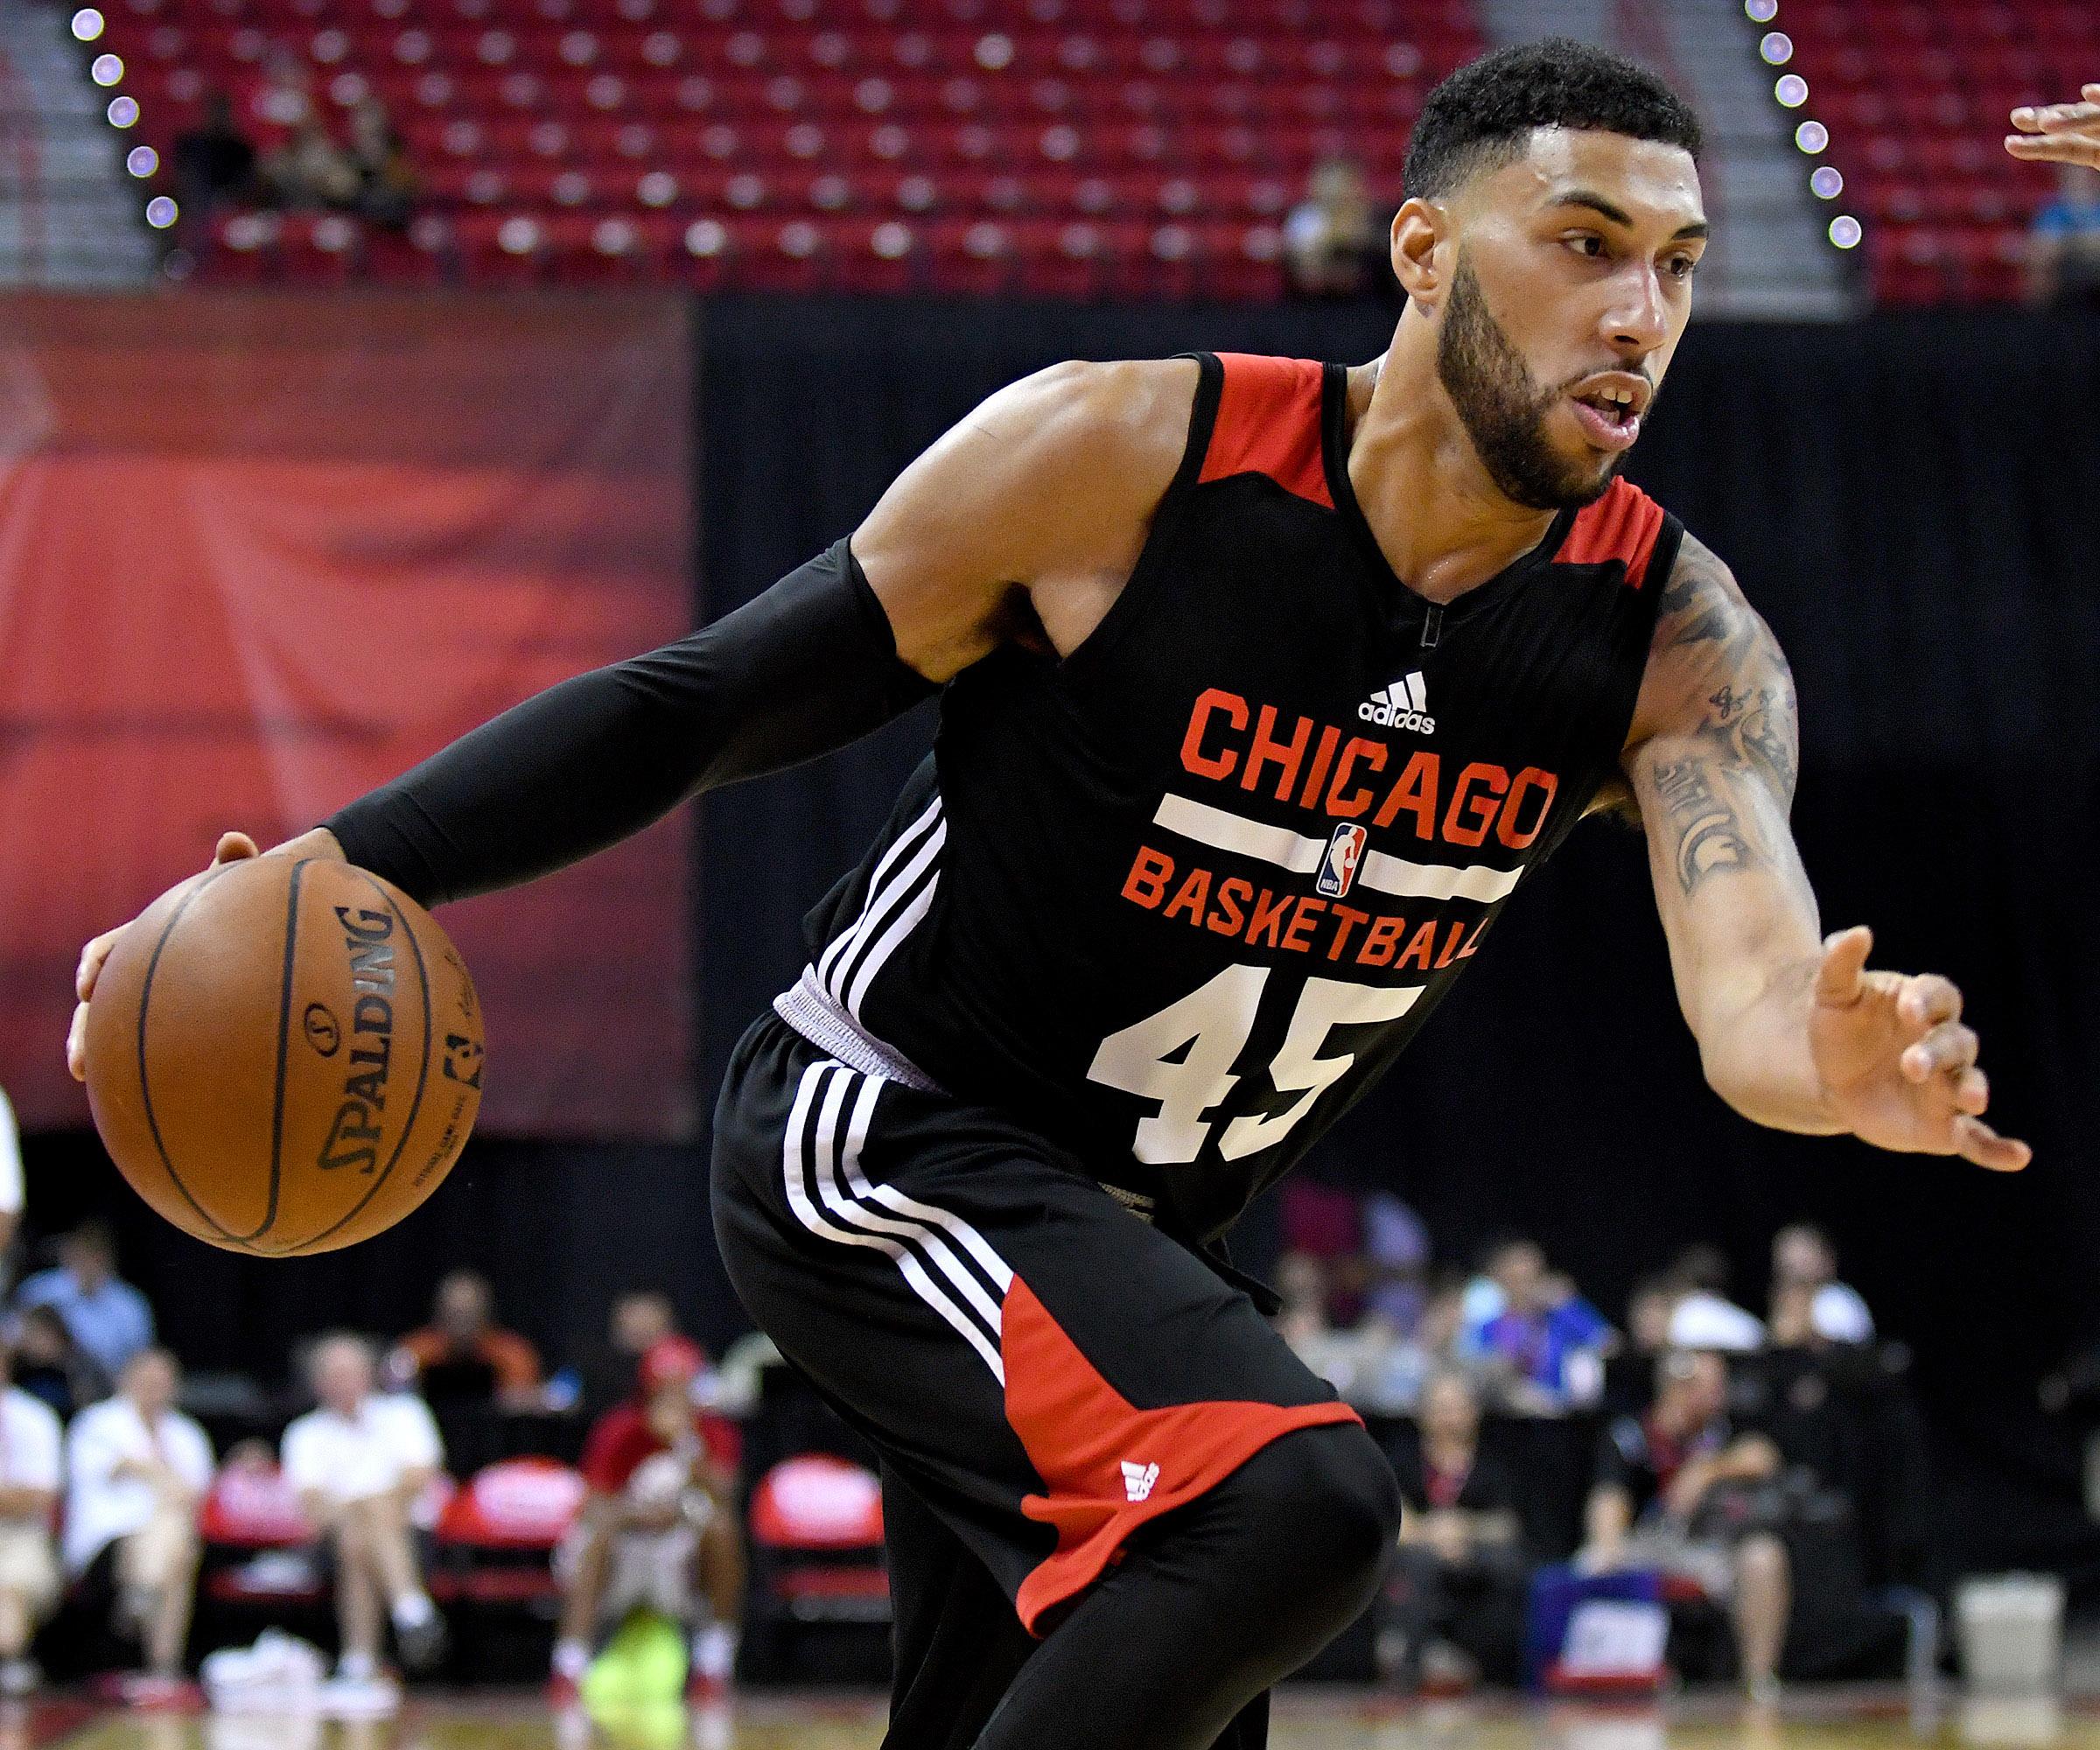 NBA Summer League schedule 2016: Timberwolves take on Bulls for Las Vegas title